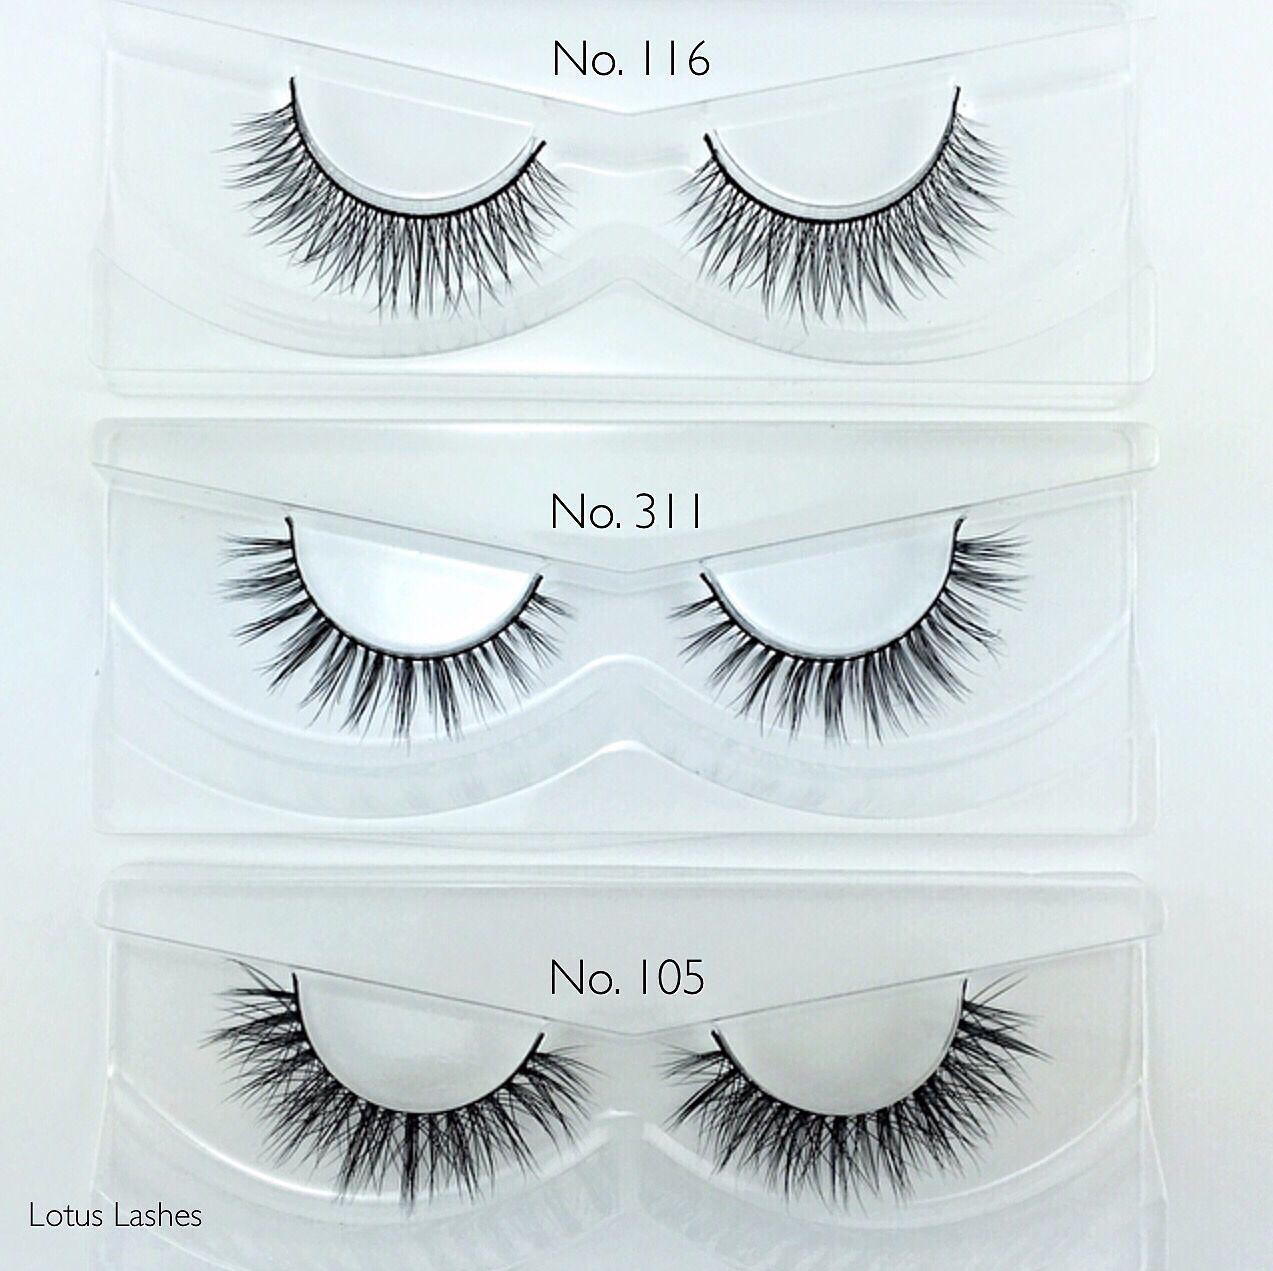 e00e1431e61 Lotus Lashes natural false eyelash styles | // Our Beautiful Lashes ...